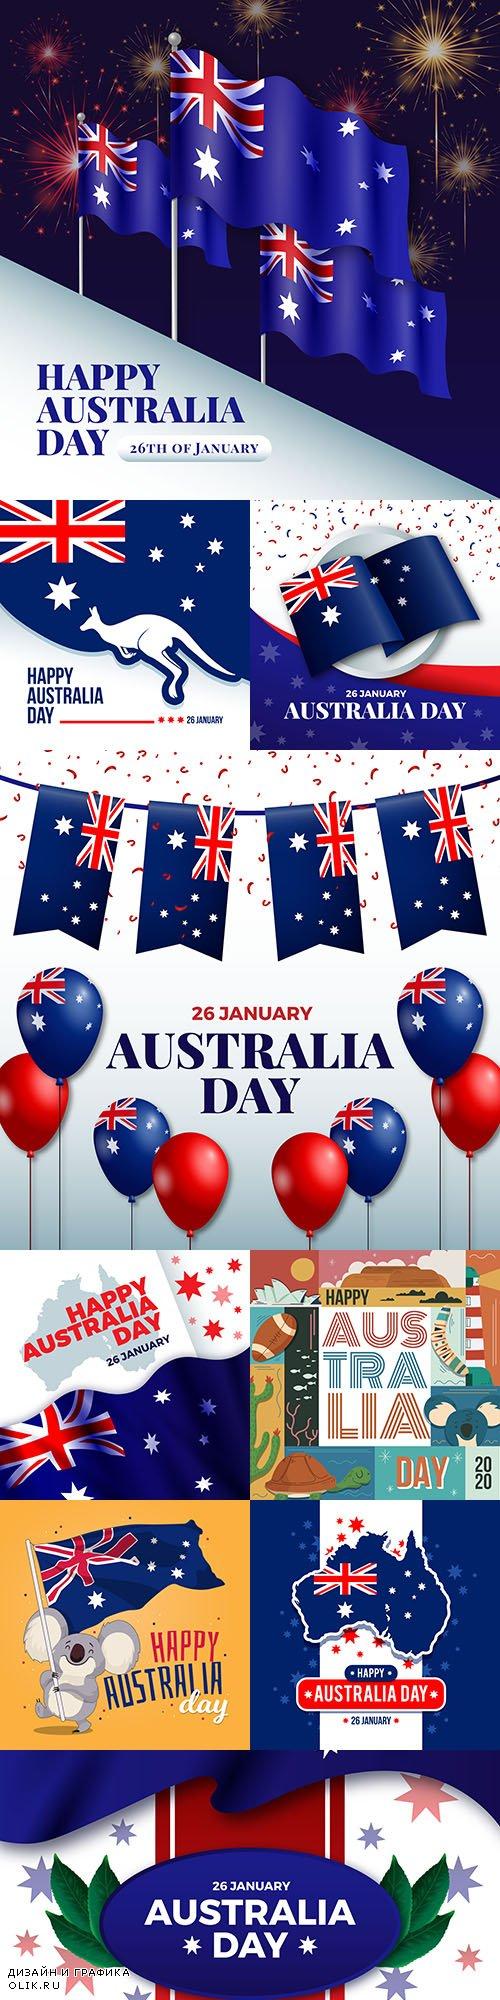 Happy Australia day holiday design illustrations